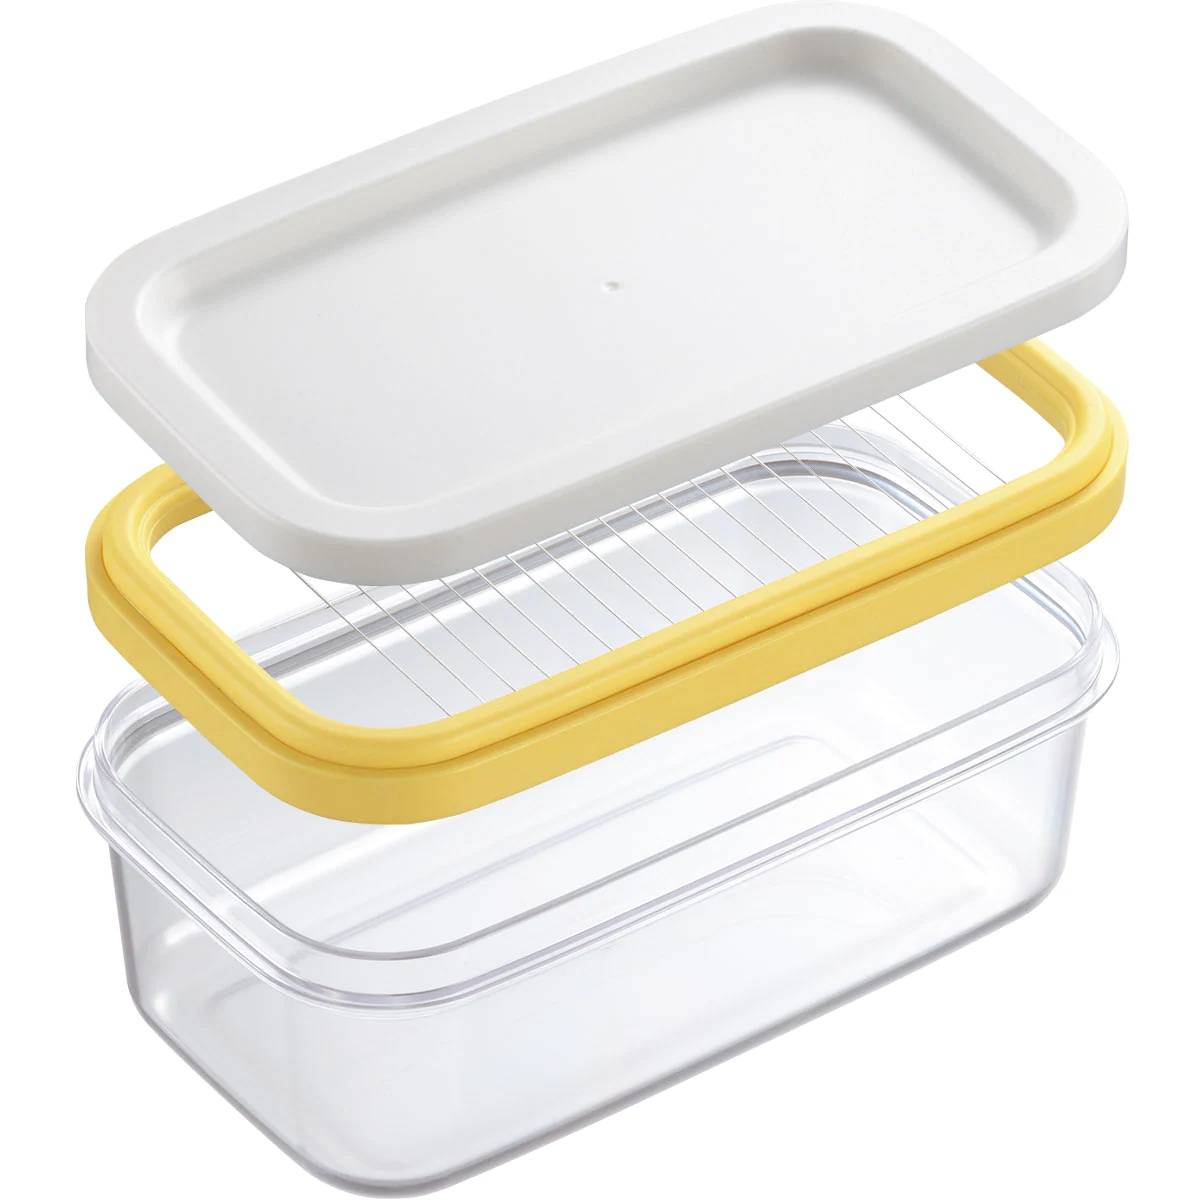 NITORI(ニトリ) バターケースの商品画像2